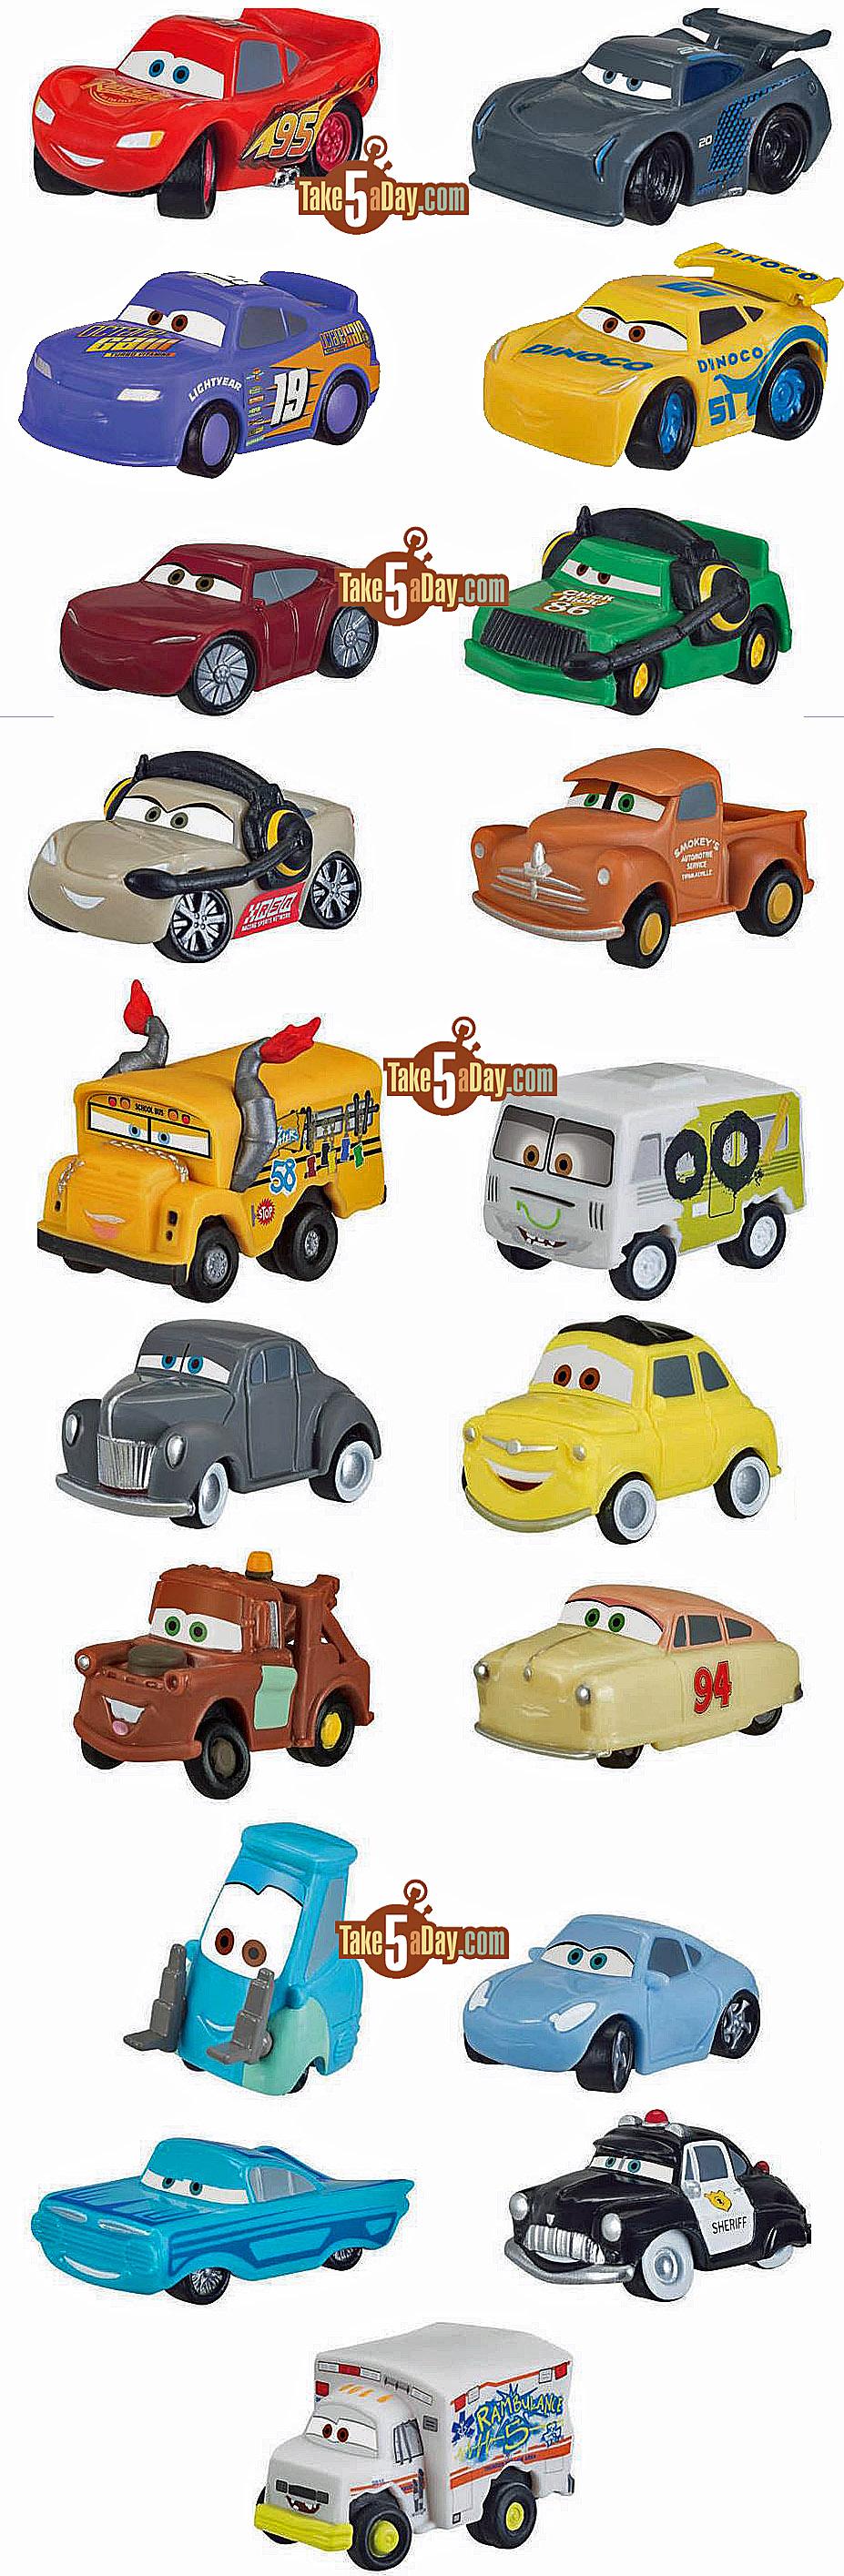 Disney Pixar Cars 3 The New Mini S Mini S Blind Bag Disney